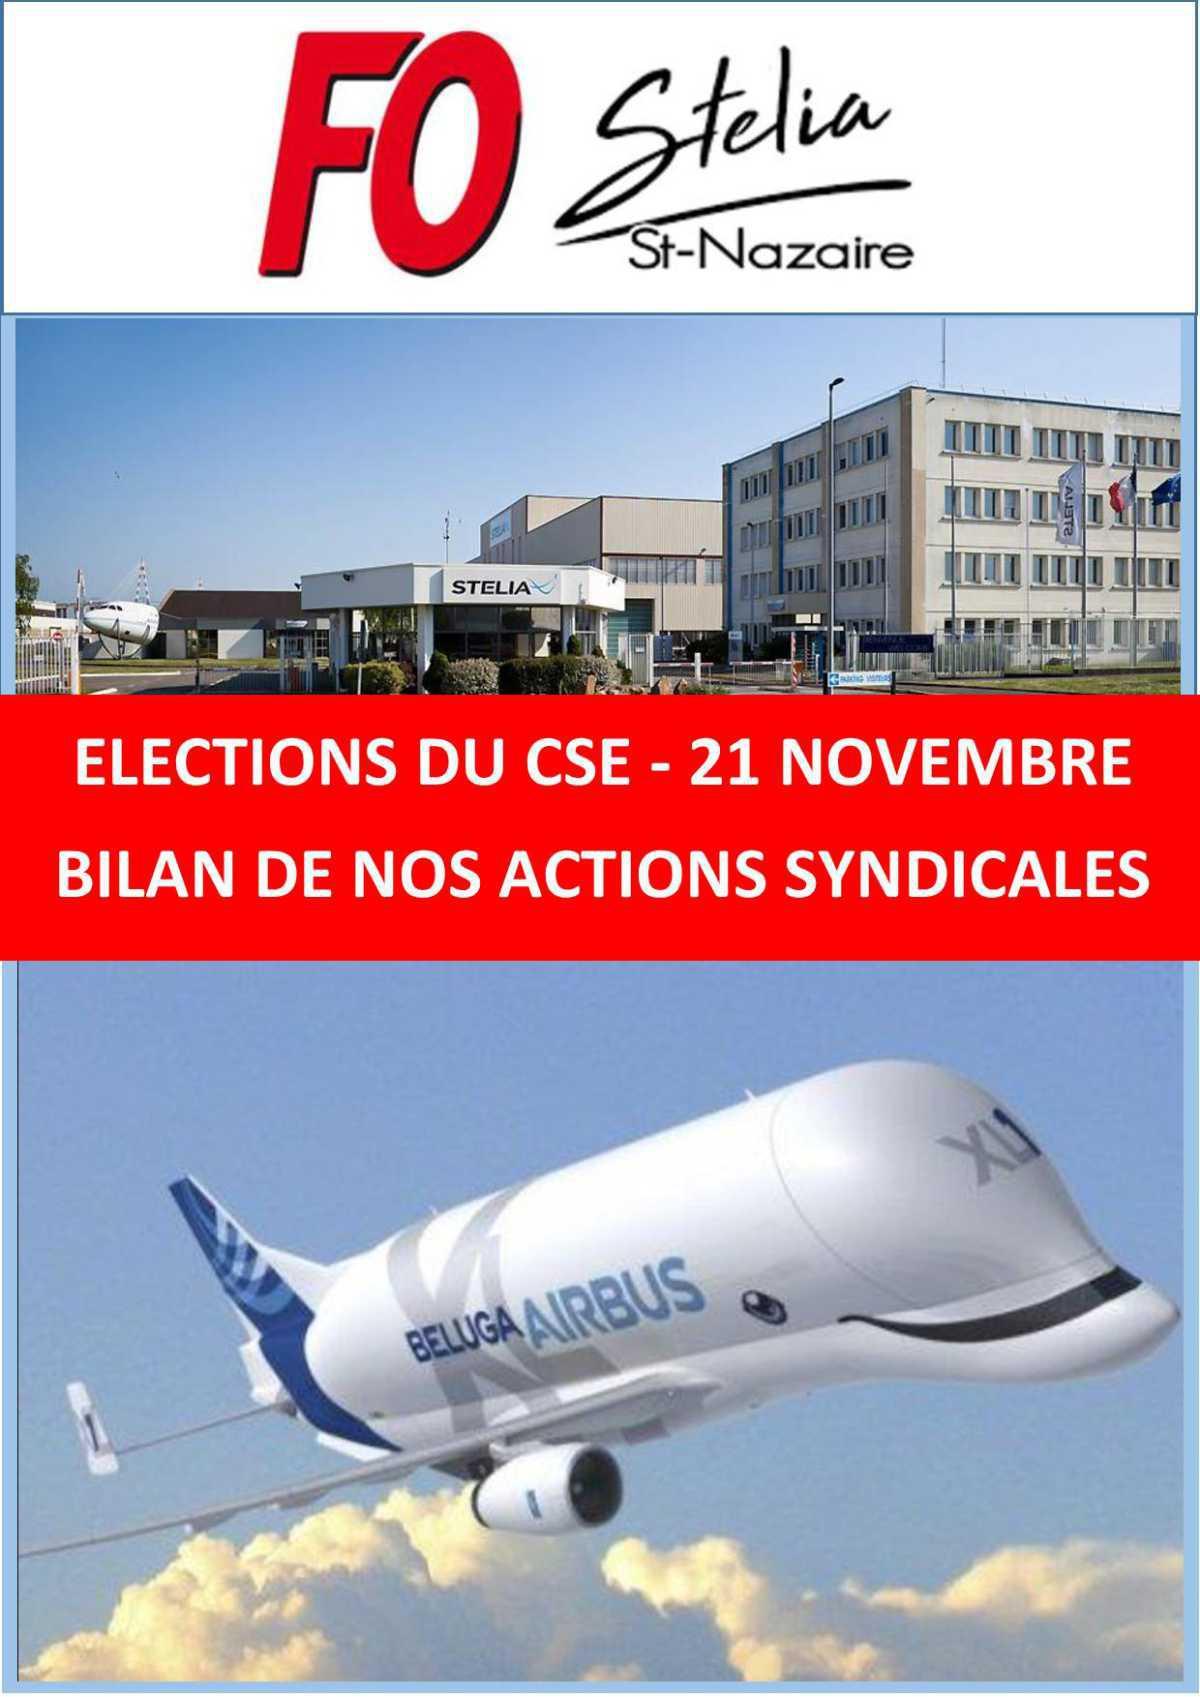 BILAN DE NOS ACTIONS